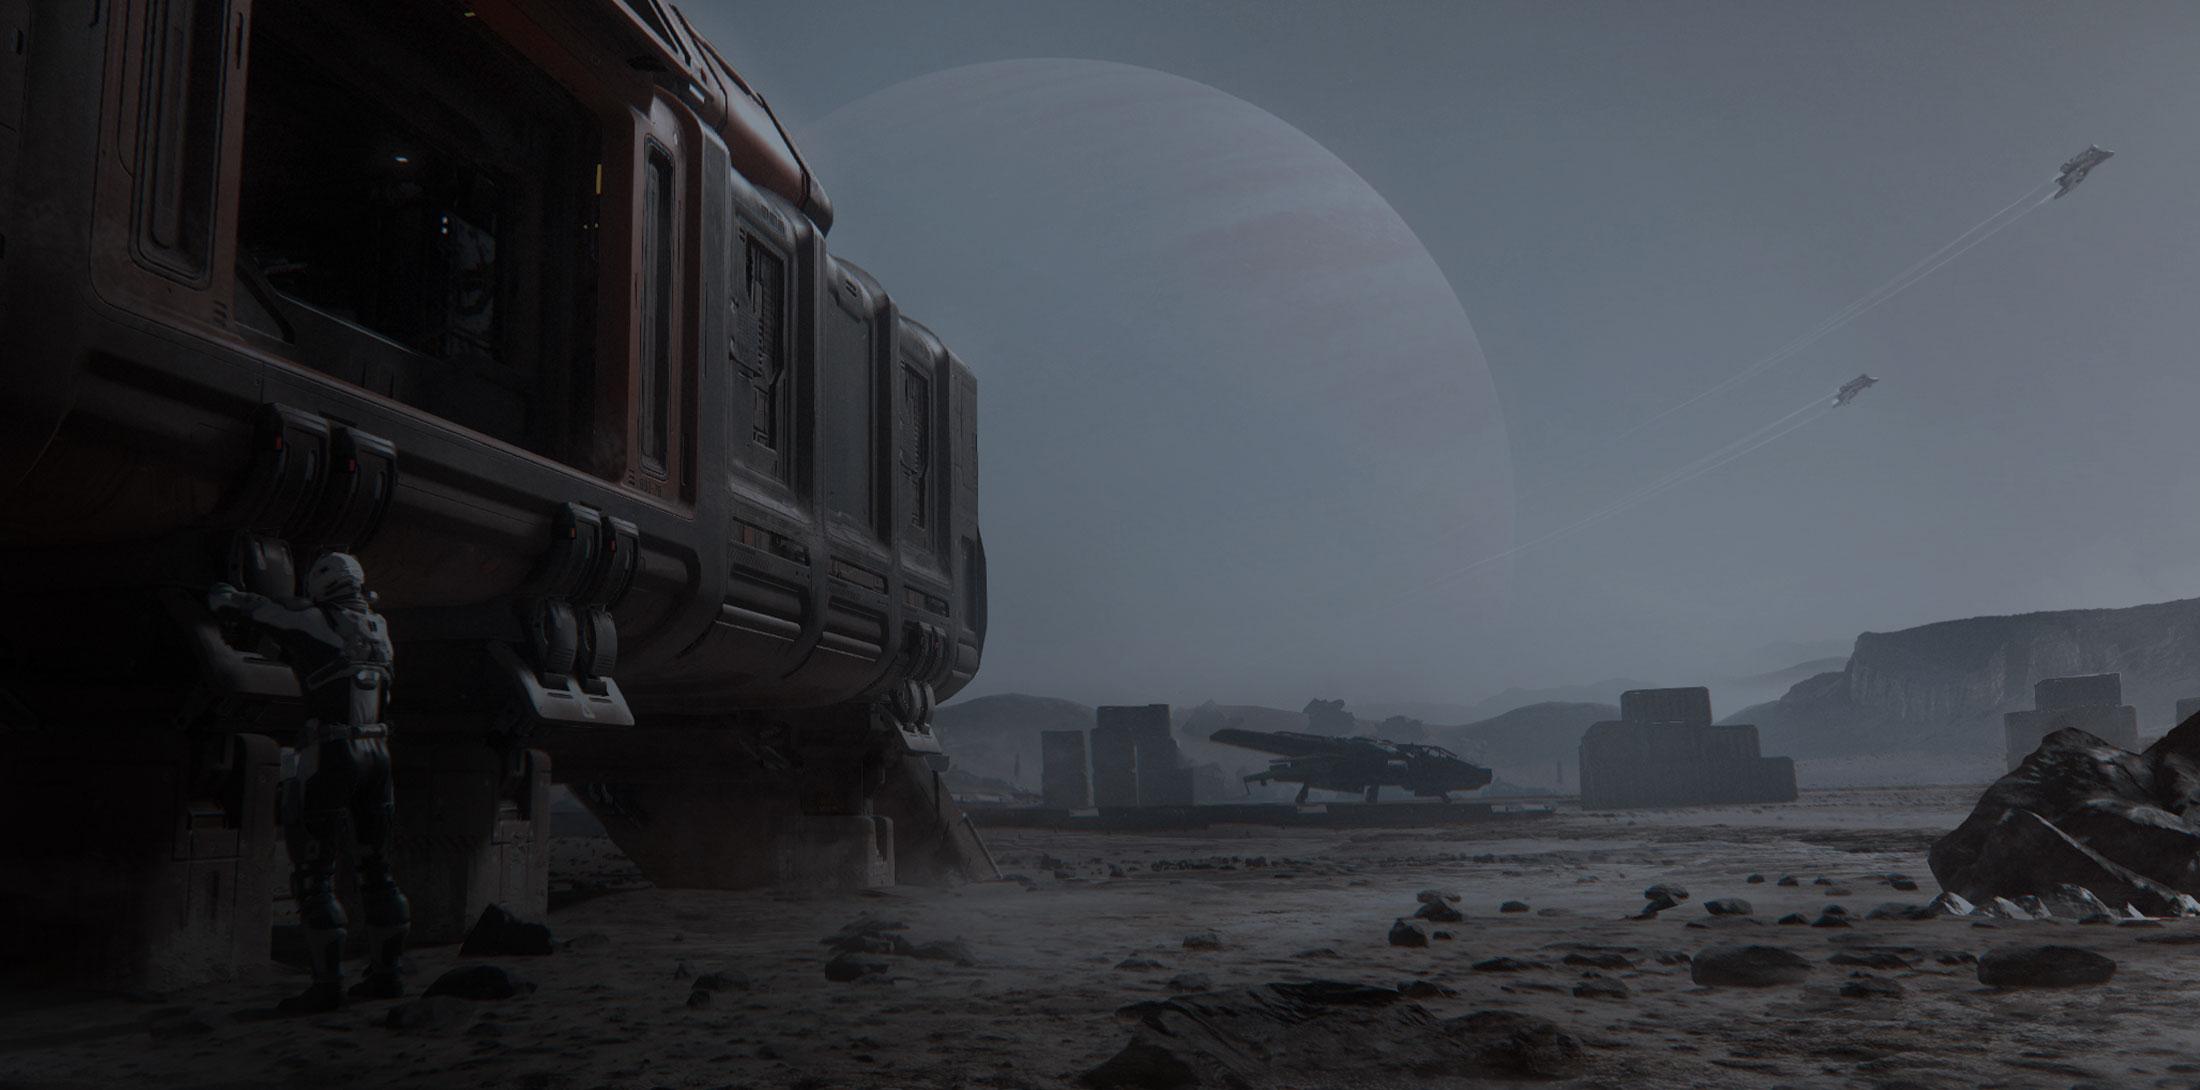 star citizen 3.0 leaked screenshot planetside